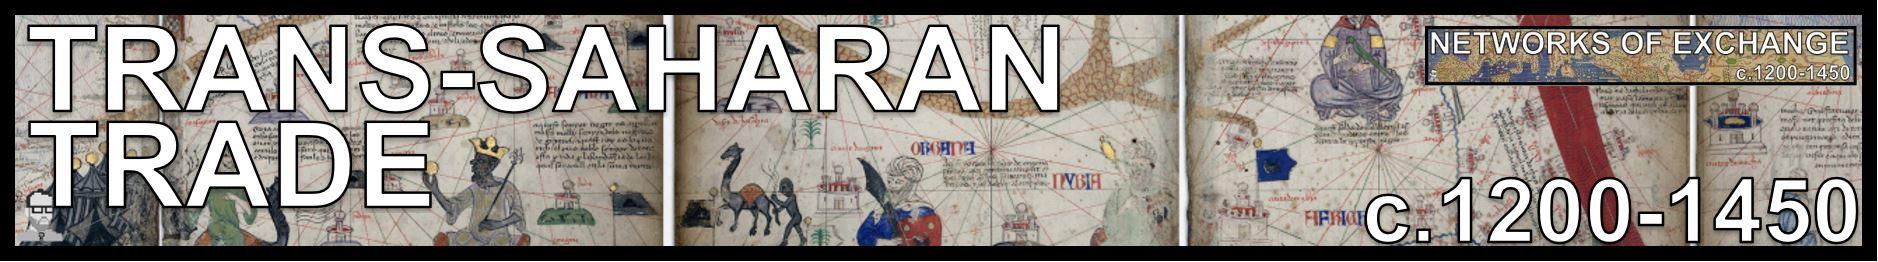 2.4 TRANS SAHARAN TRADE  NETWORKS OF EXCHANGE FREEMANPEDIA AP WORLD MODERN.JPG